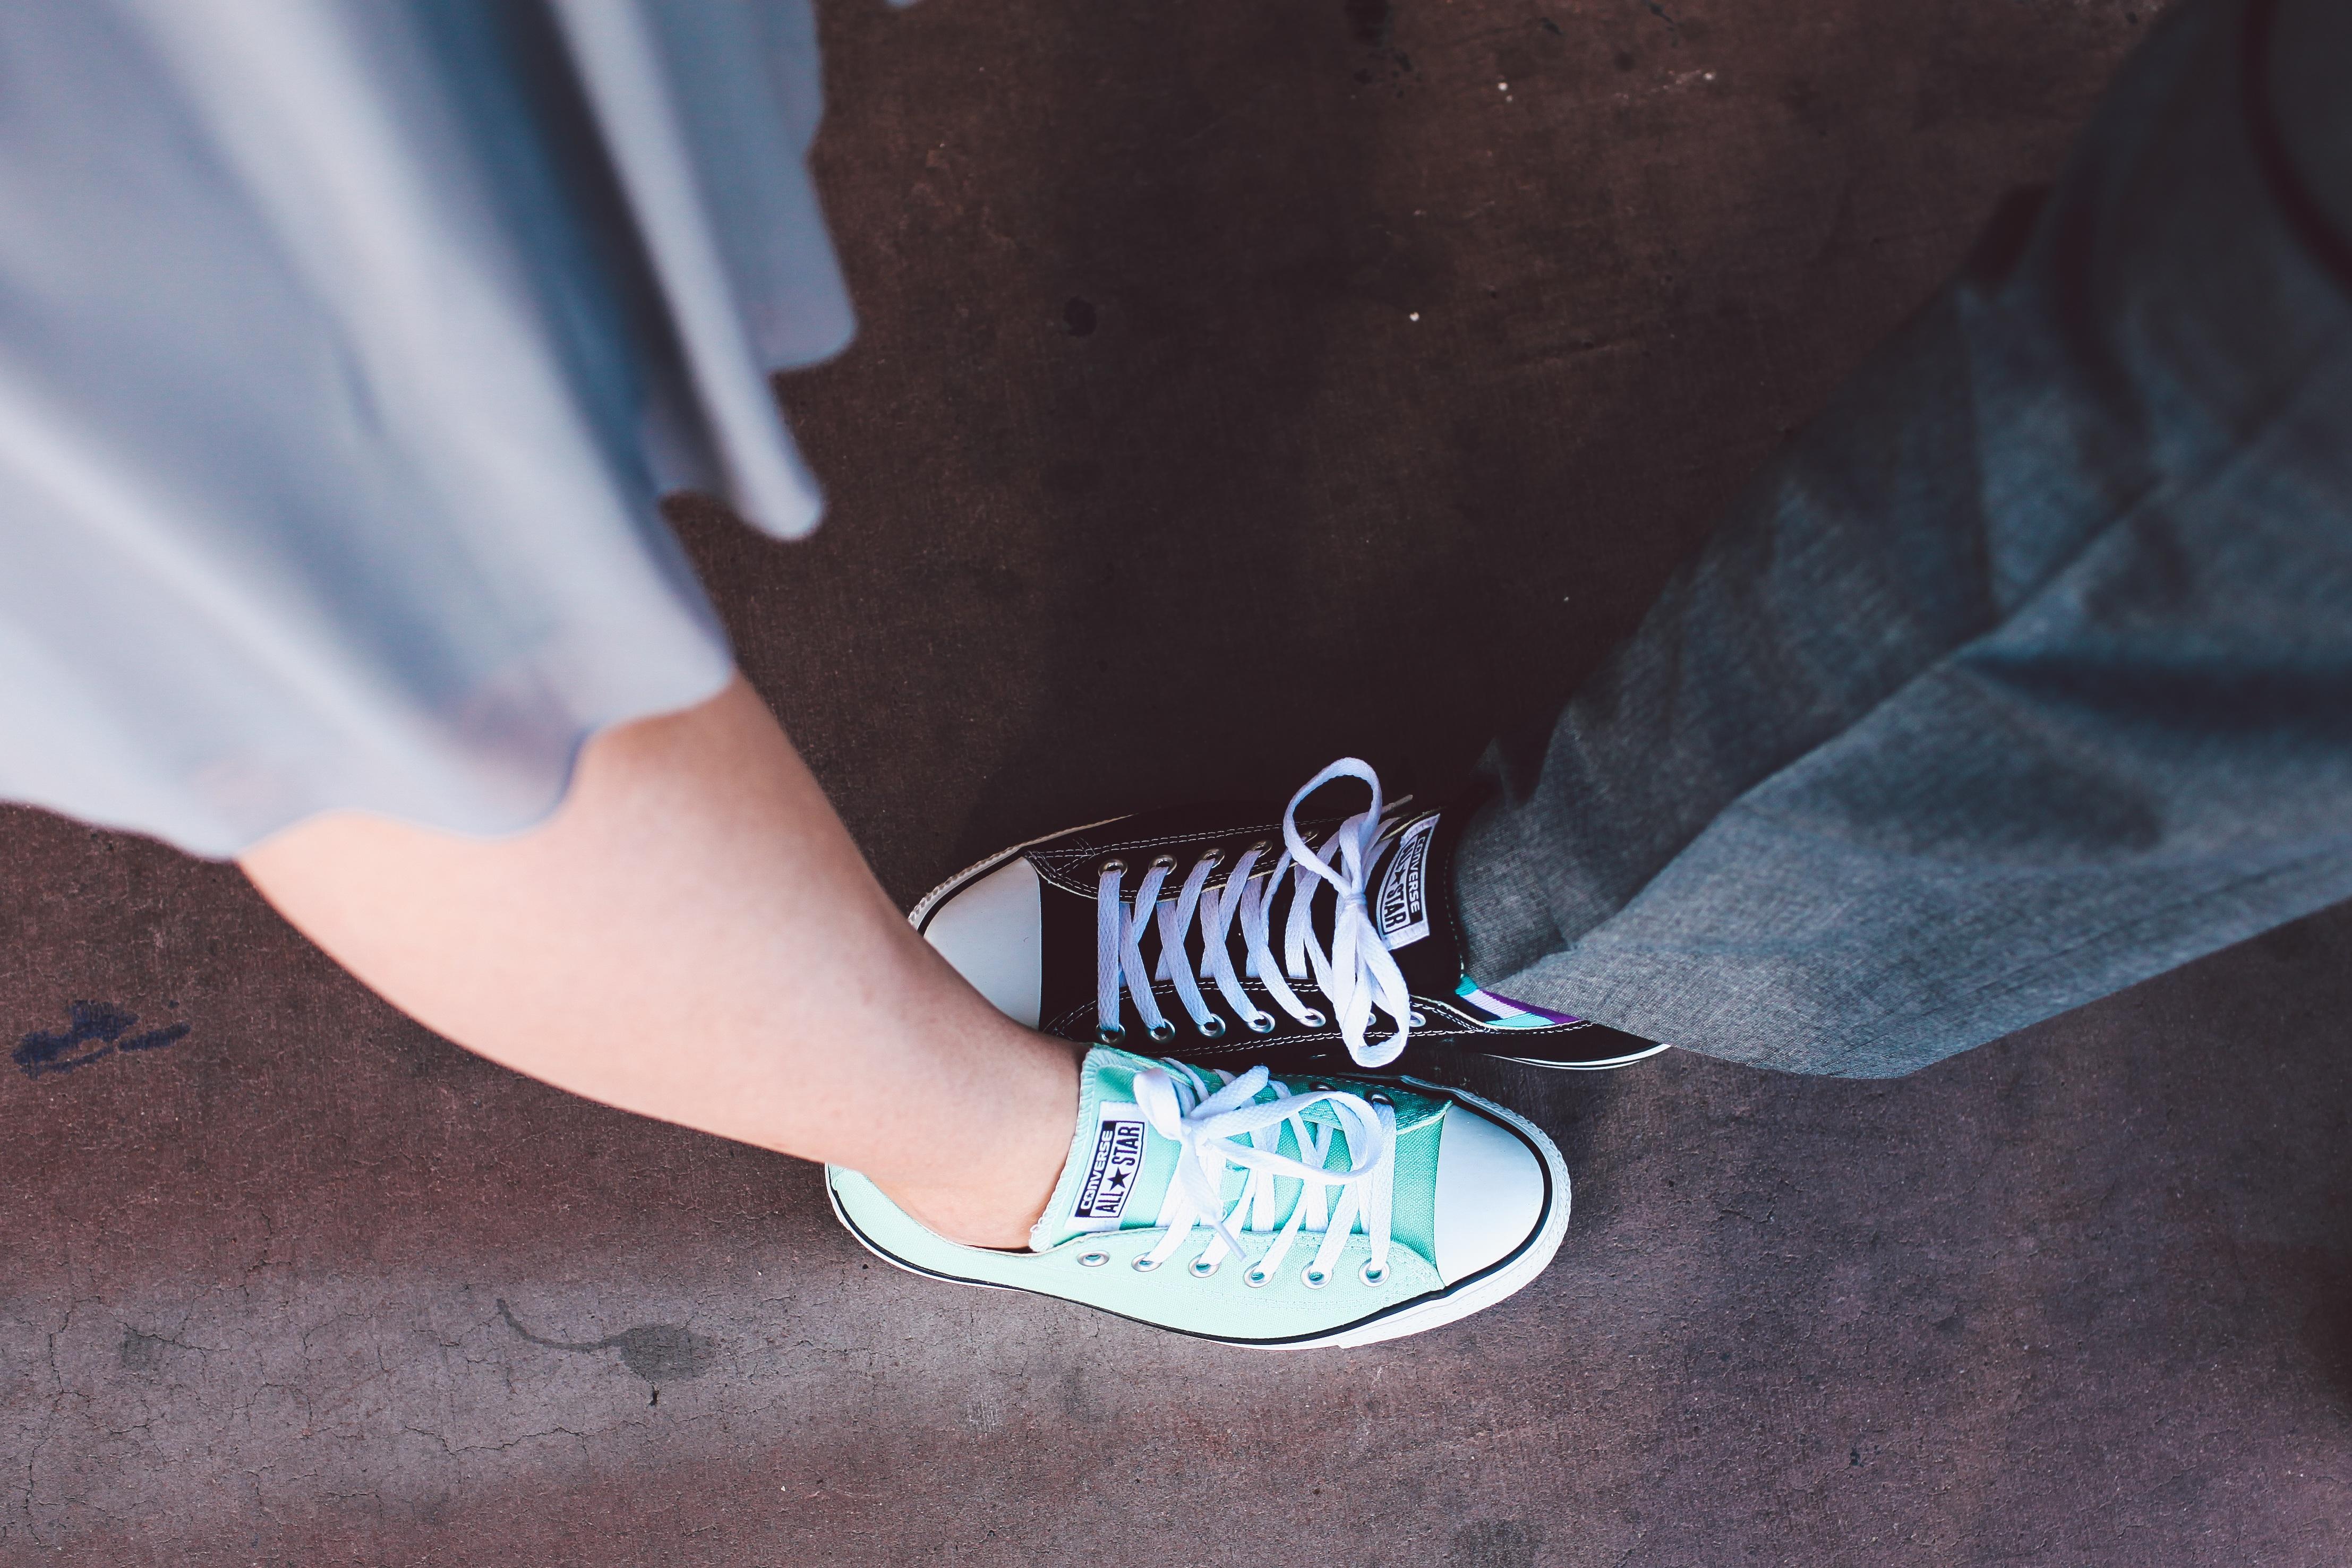 7938aade1633 hand shoe girl white feet leg spring green color blue black arm all star  human body